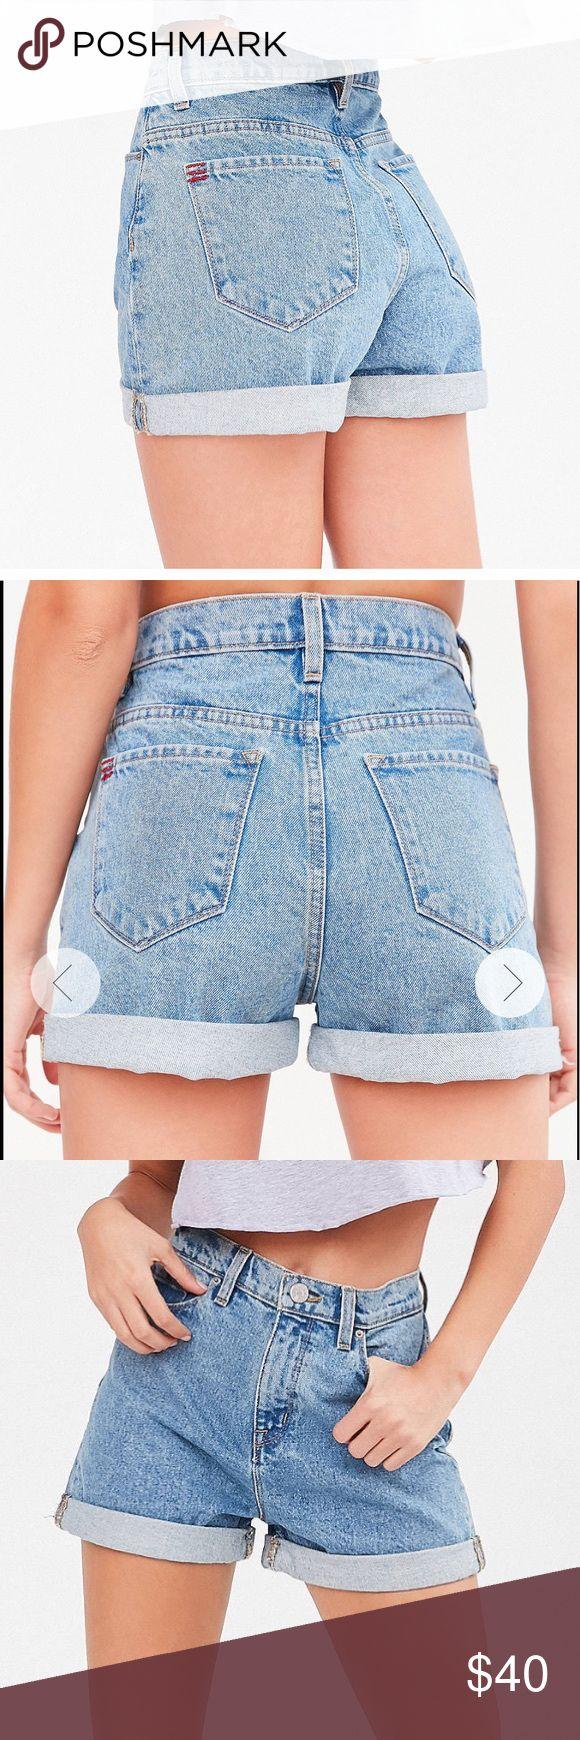 Best 20  Urban outfitters shorts ideas on Pinterest | Ck bikini ...